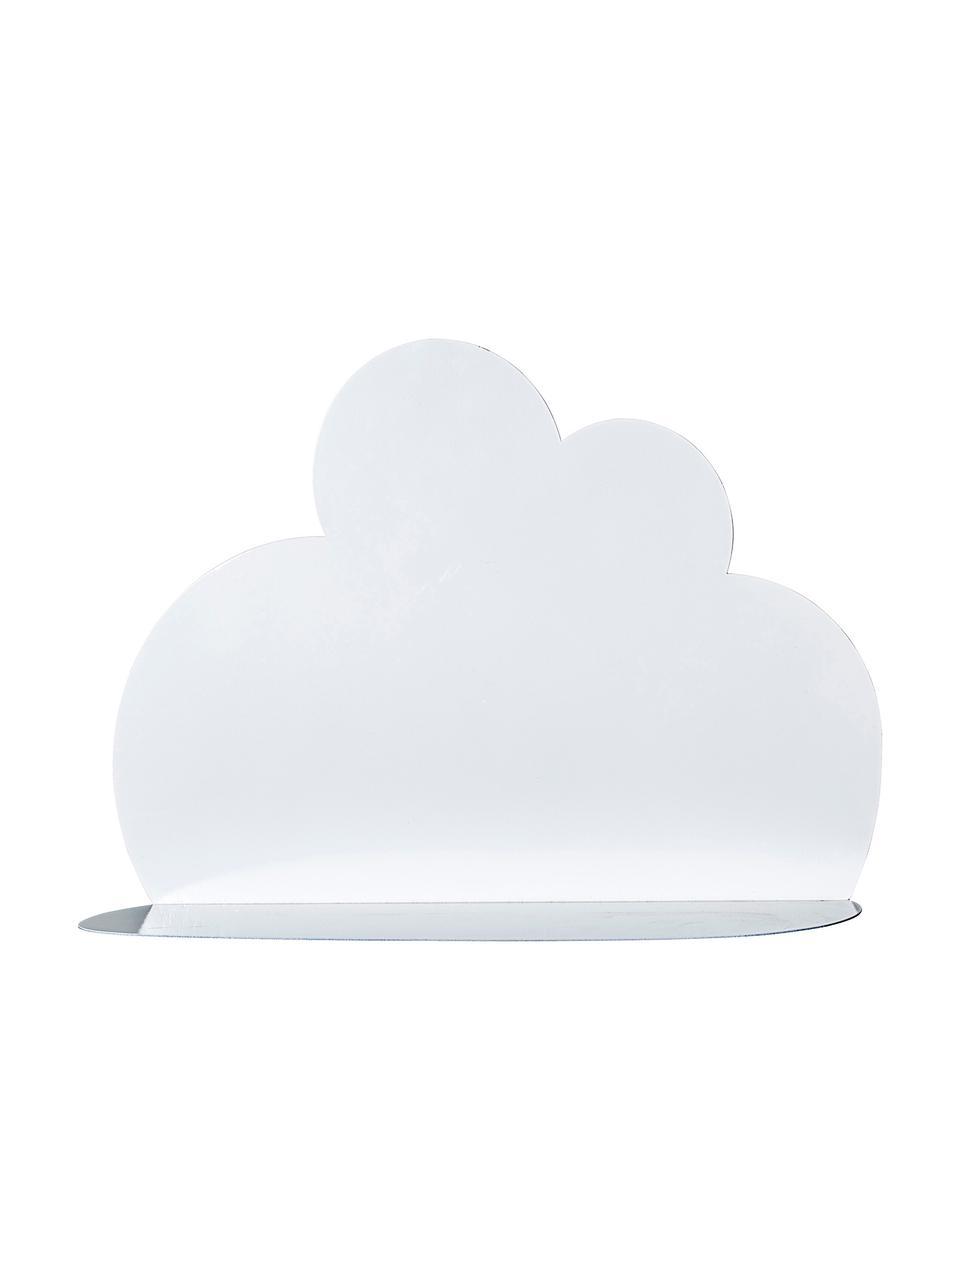 Wandregal Cloud, Metall, lackiert, Weiß, 60 x 37 cm